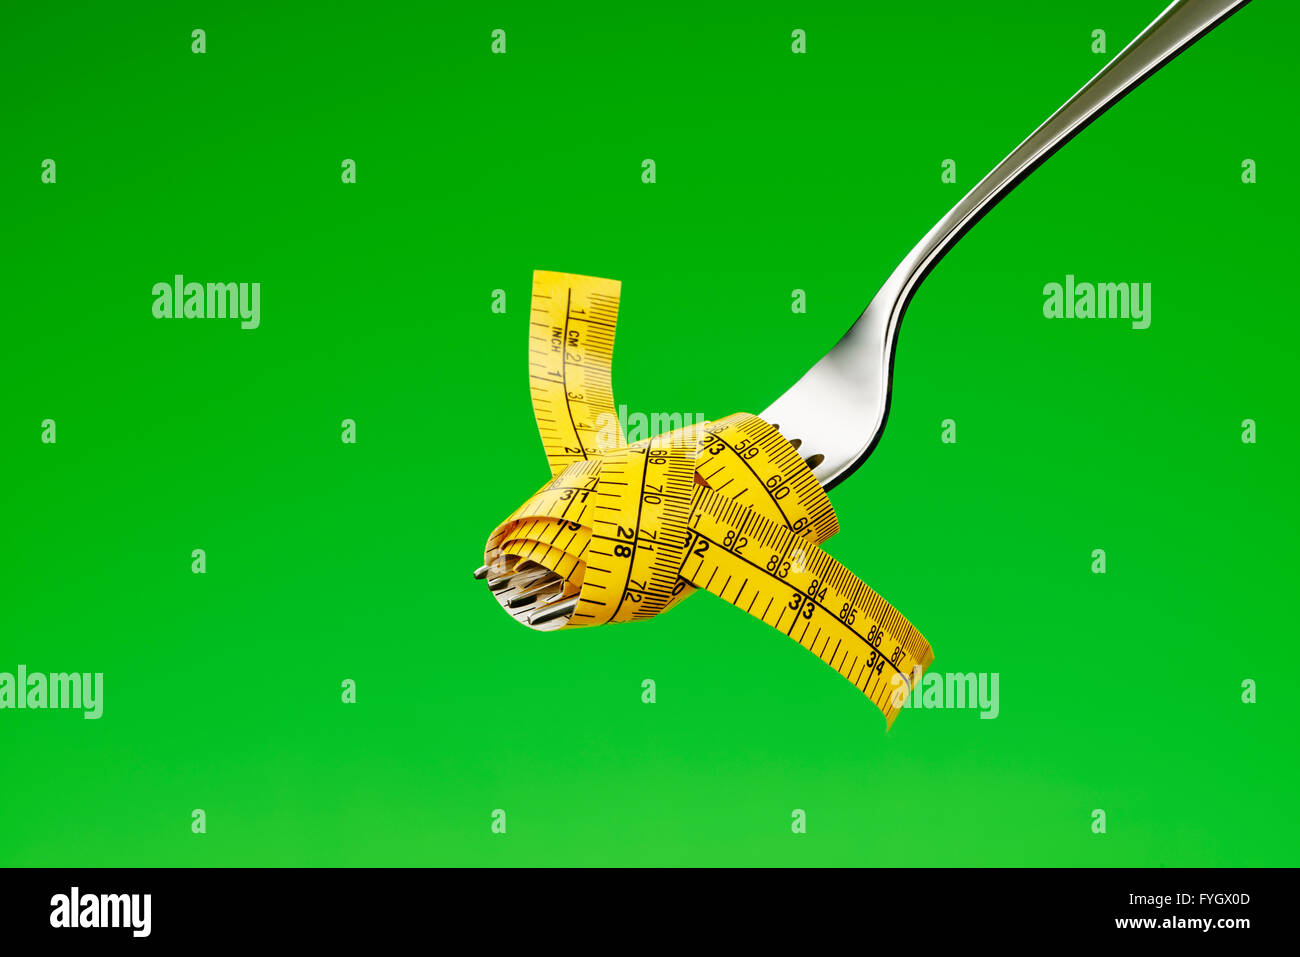 Horquilla con cinta métrica adietando concepto Obesidad Imagen De Stock